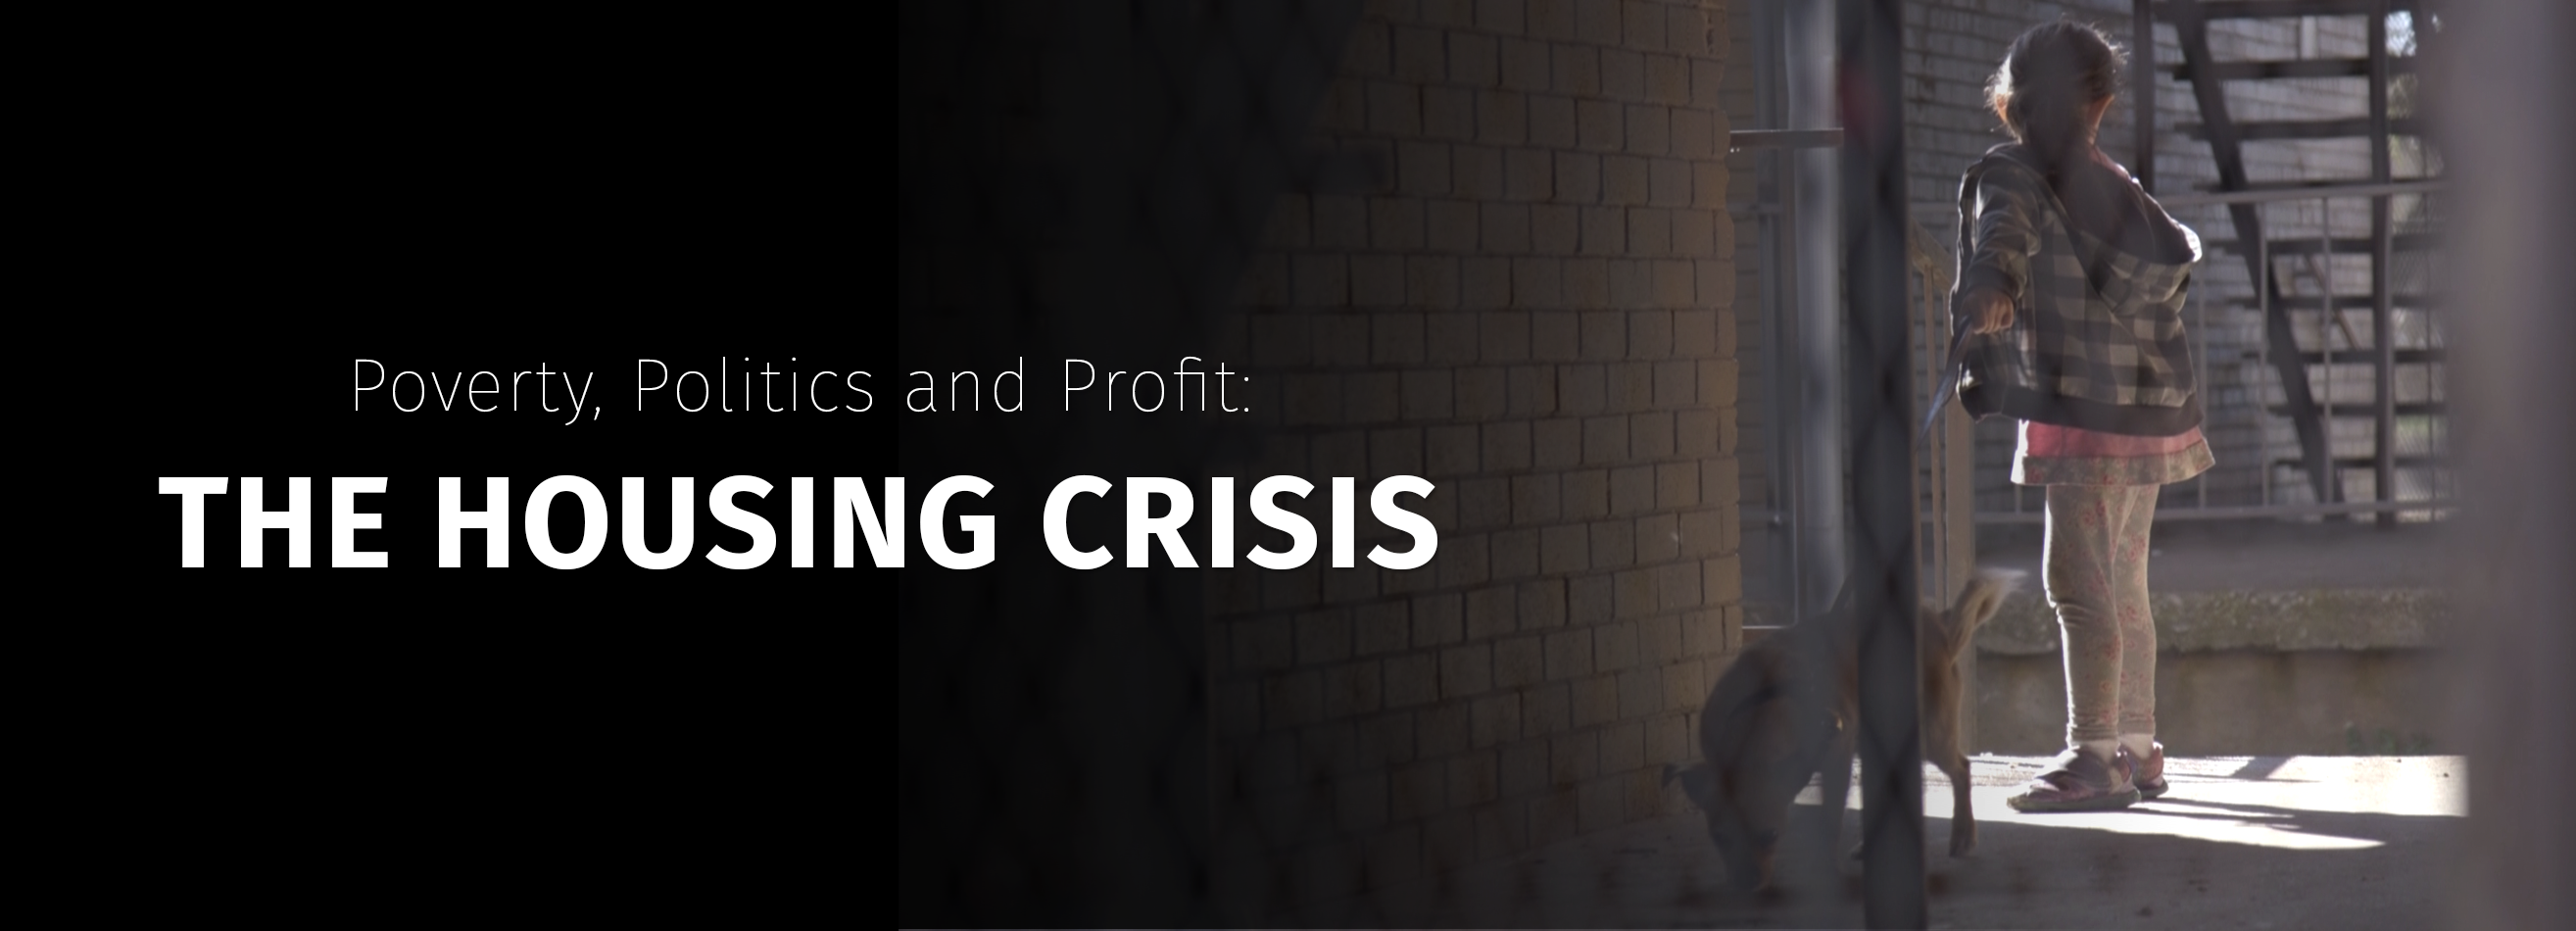 The Housing Crisis